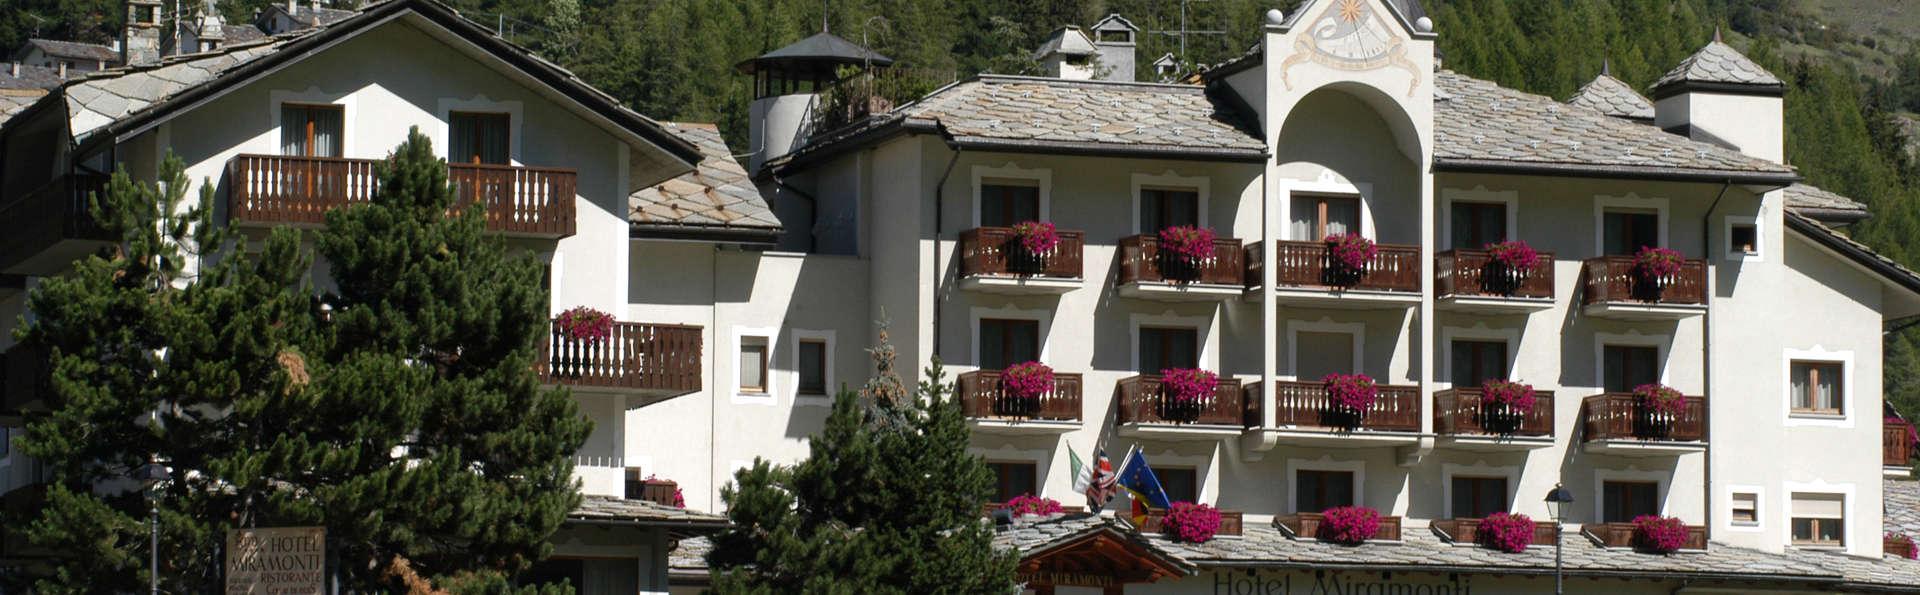 Hotel Miramonti - edit_front2.jpg